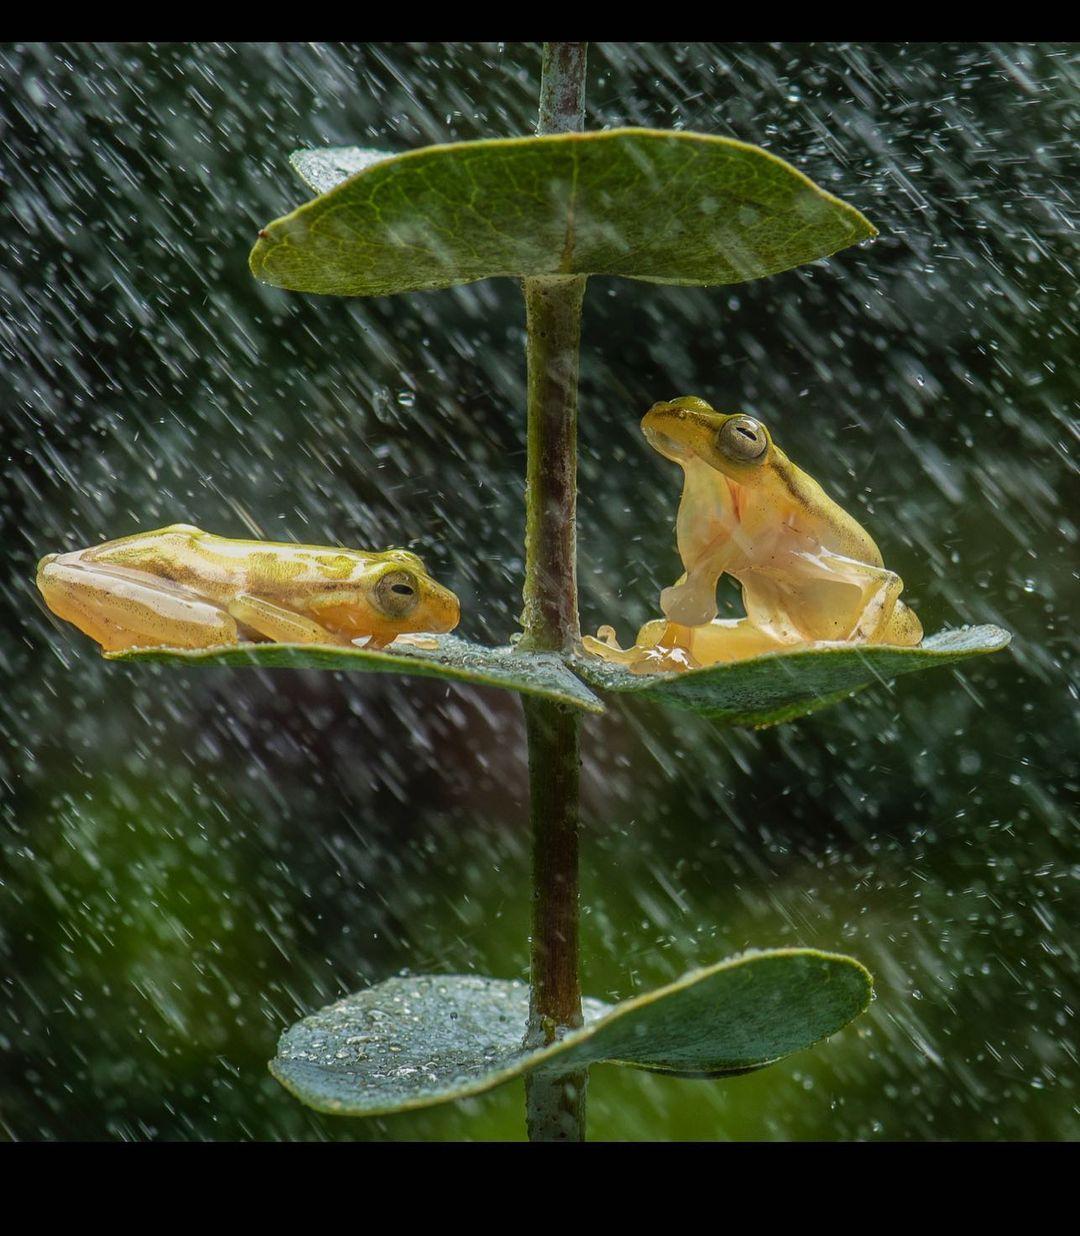 Fotógrafo nota ranas compartiendo bajo la lluvia